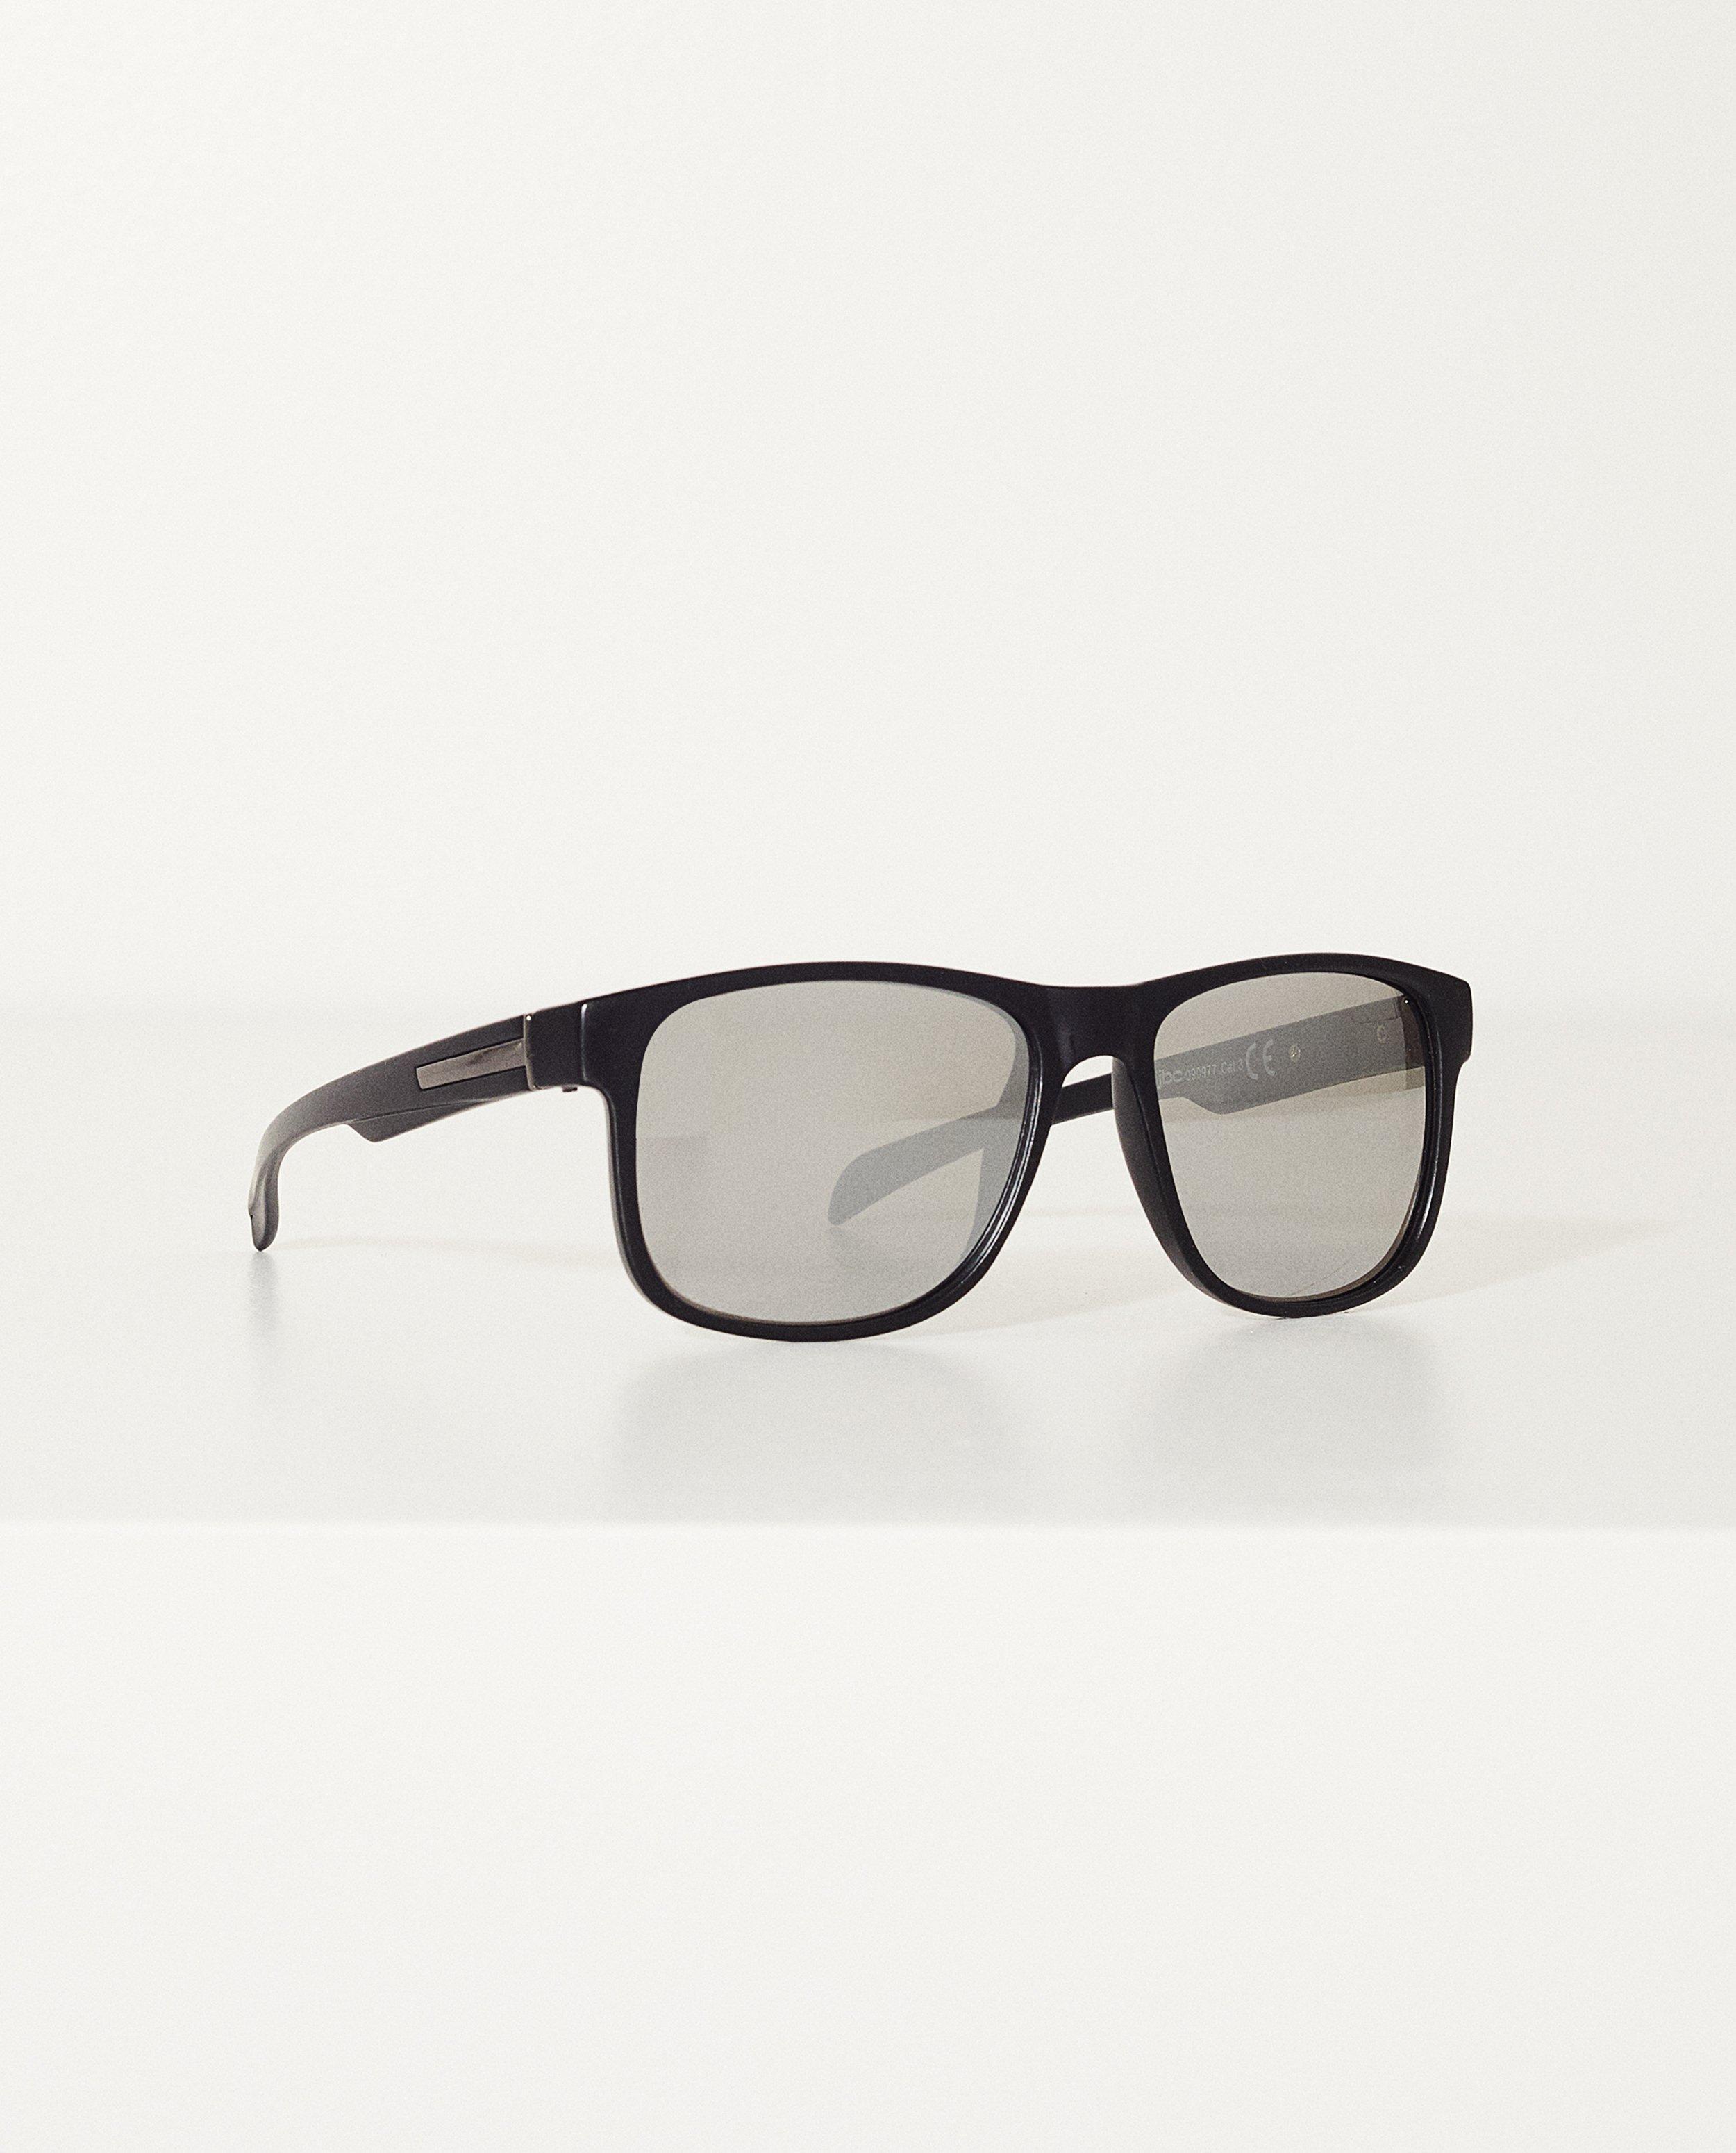 1fab0472649d6f Zwarte zonnebril Met spiegelglazen